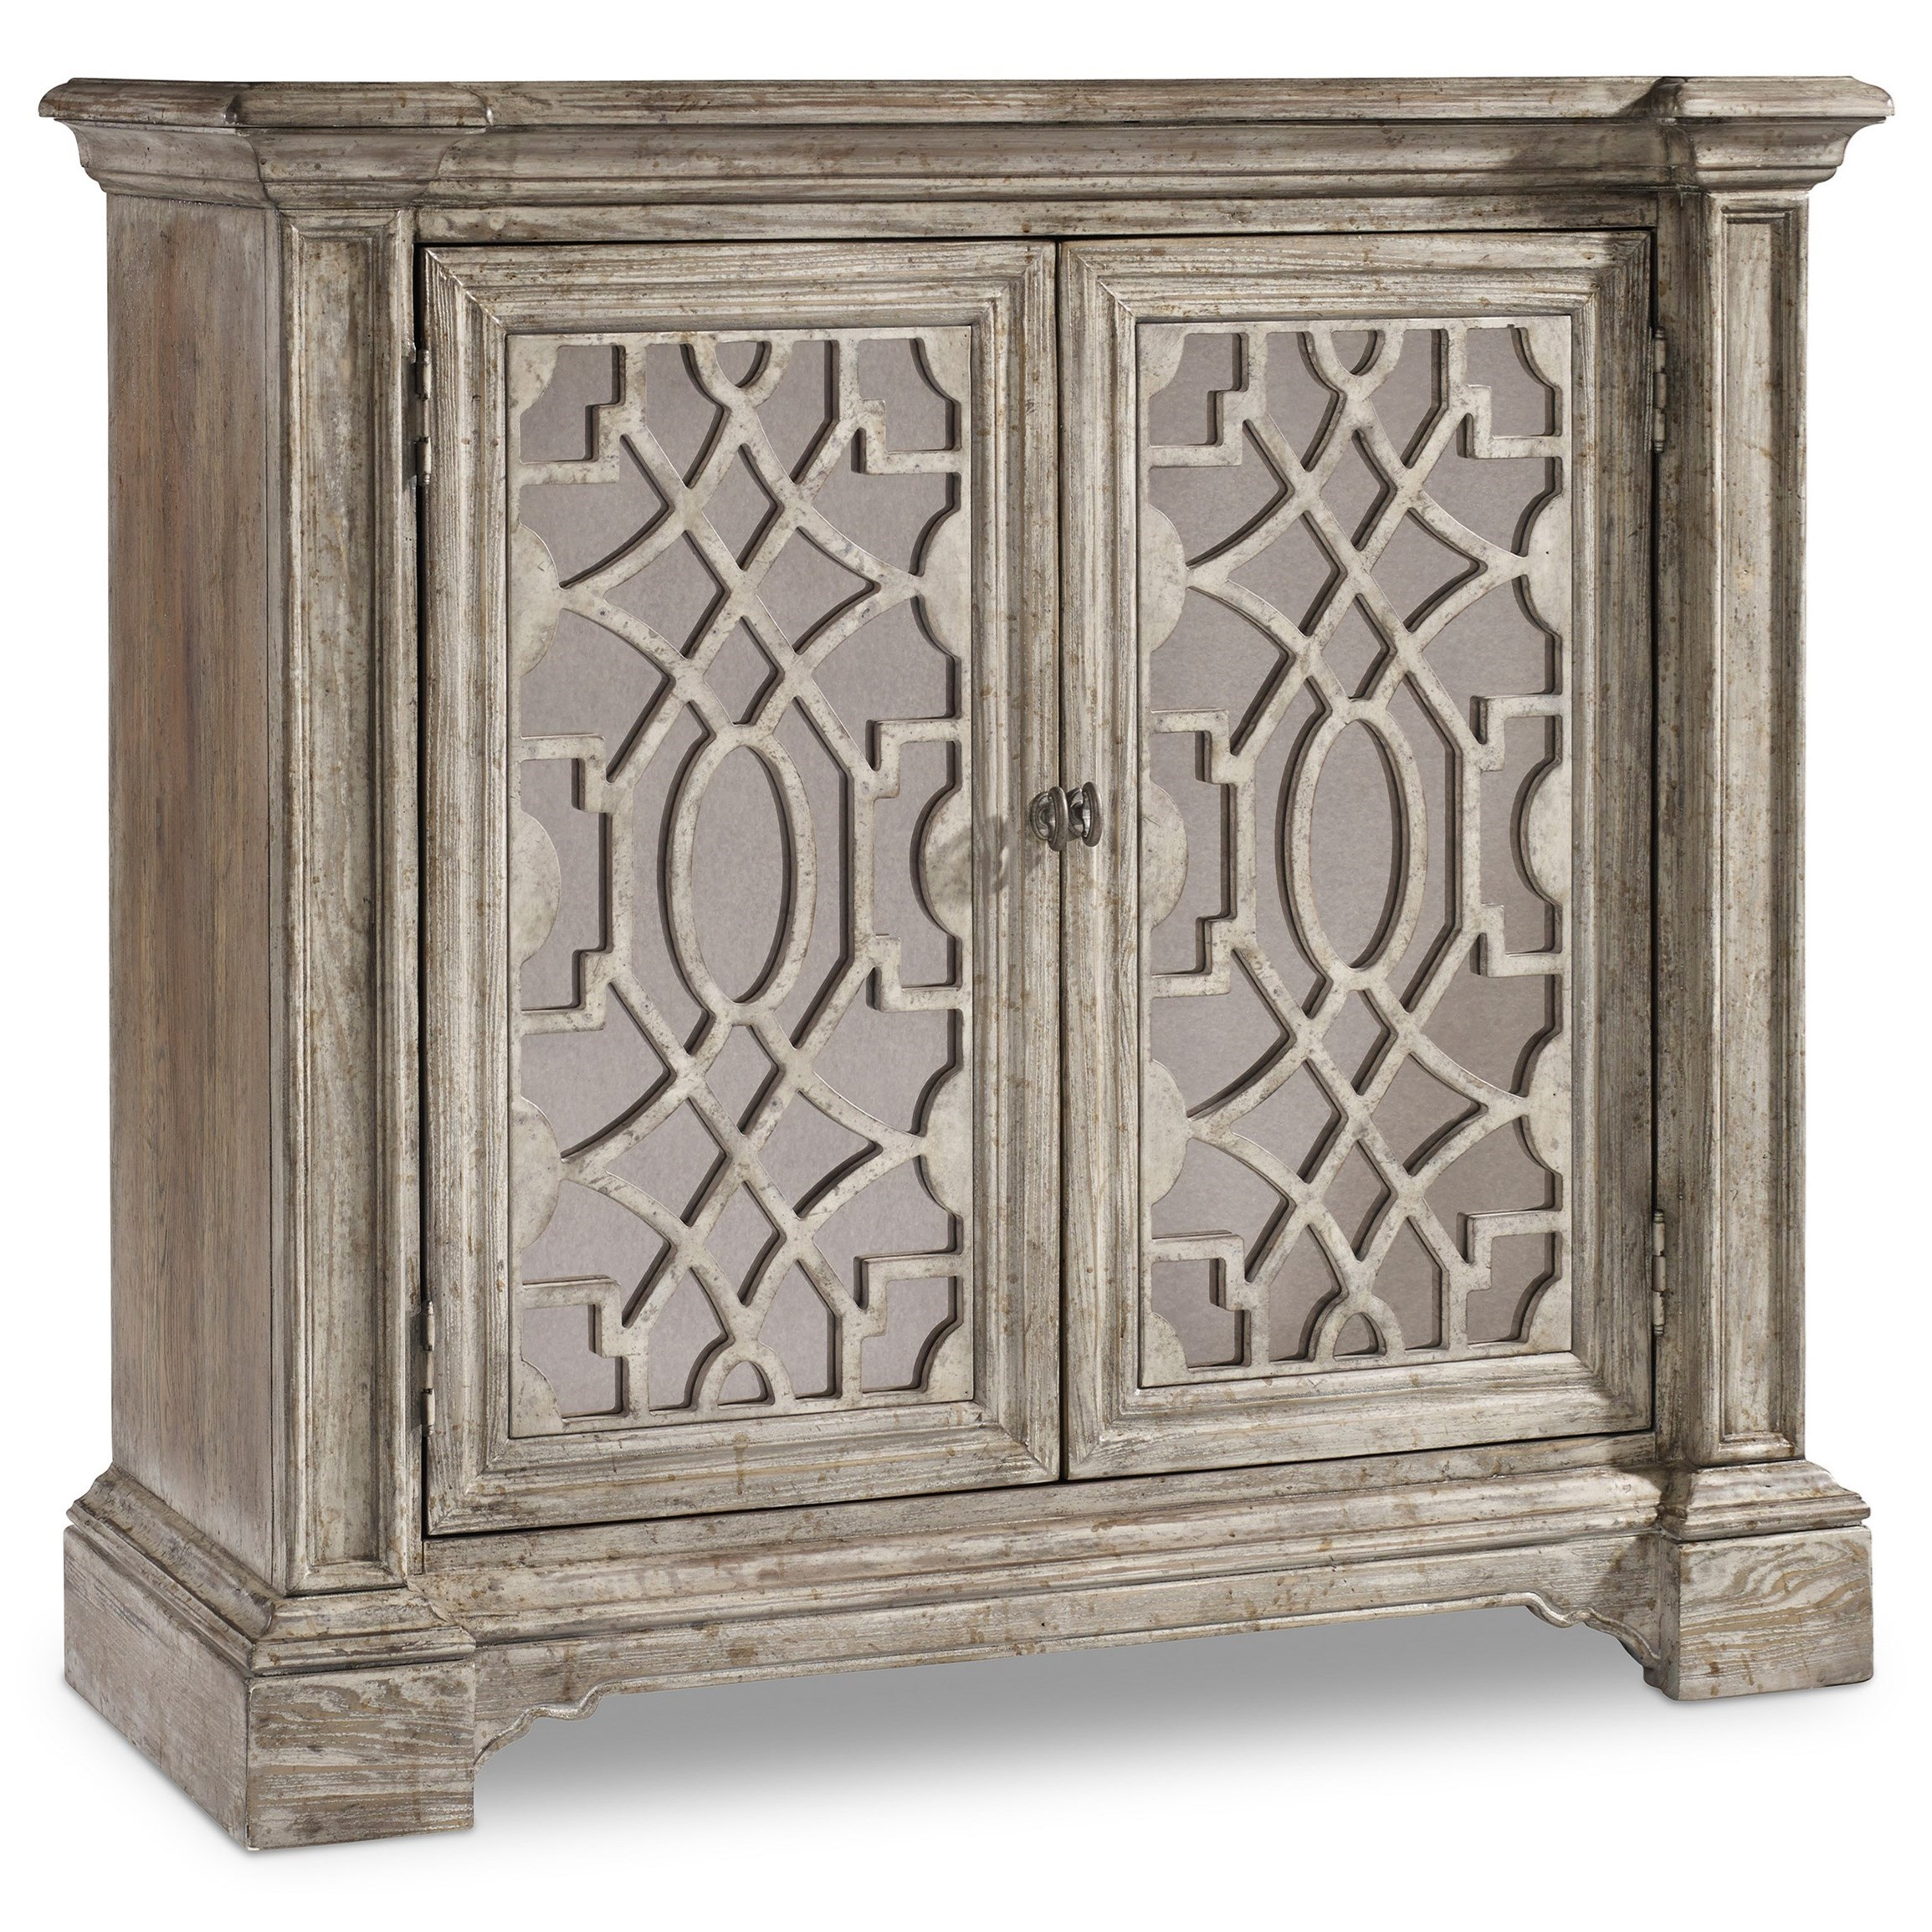 True Vintage Two-Door Chest by Hooker Furniture at Baer's Furniture